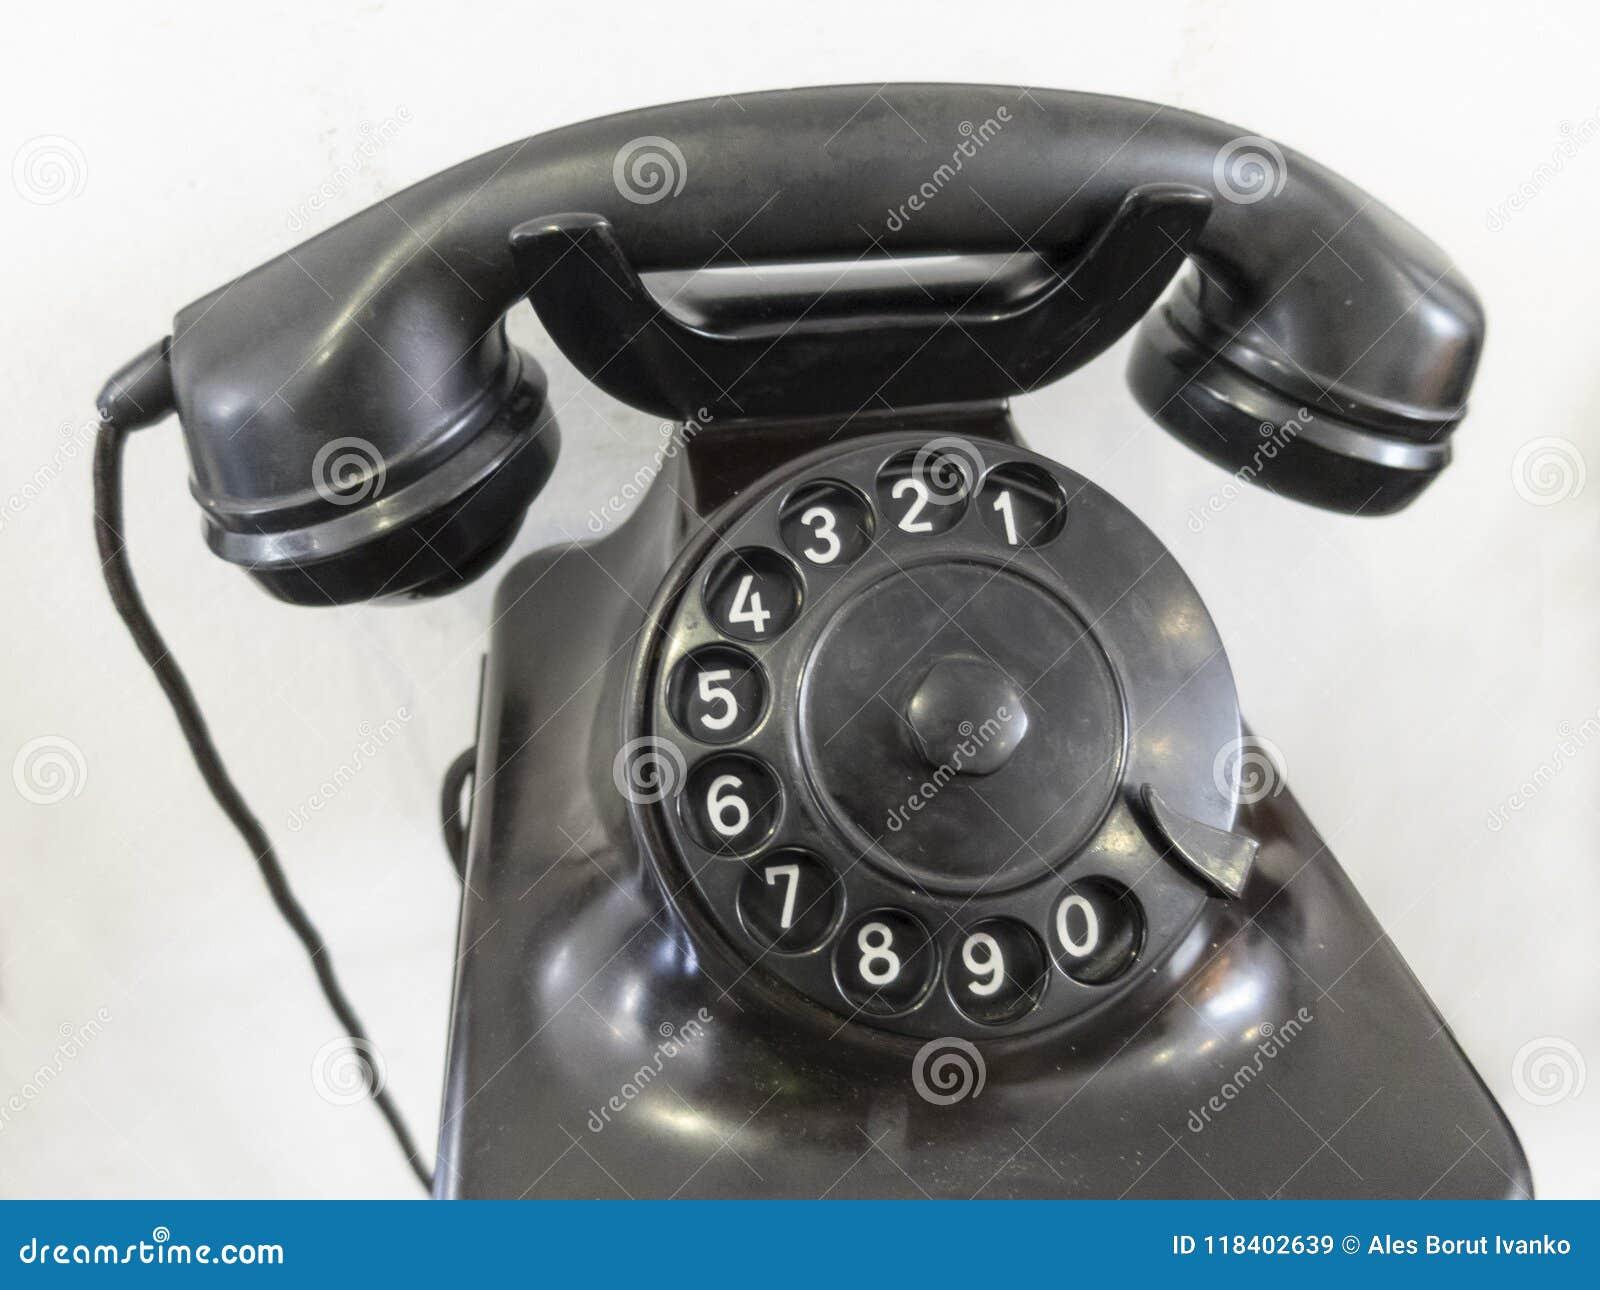 Old phone with analog rotating keyboard